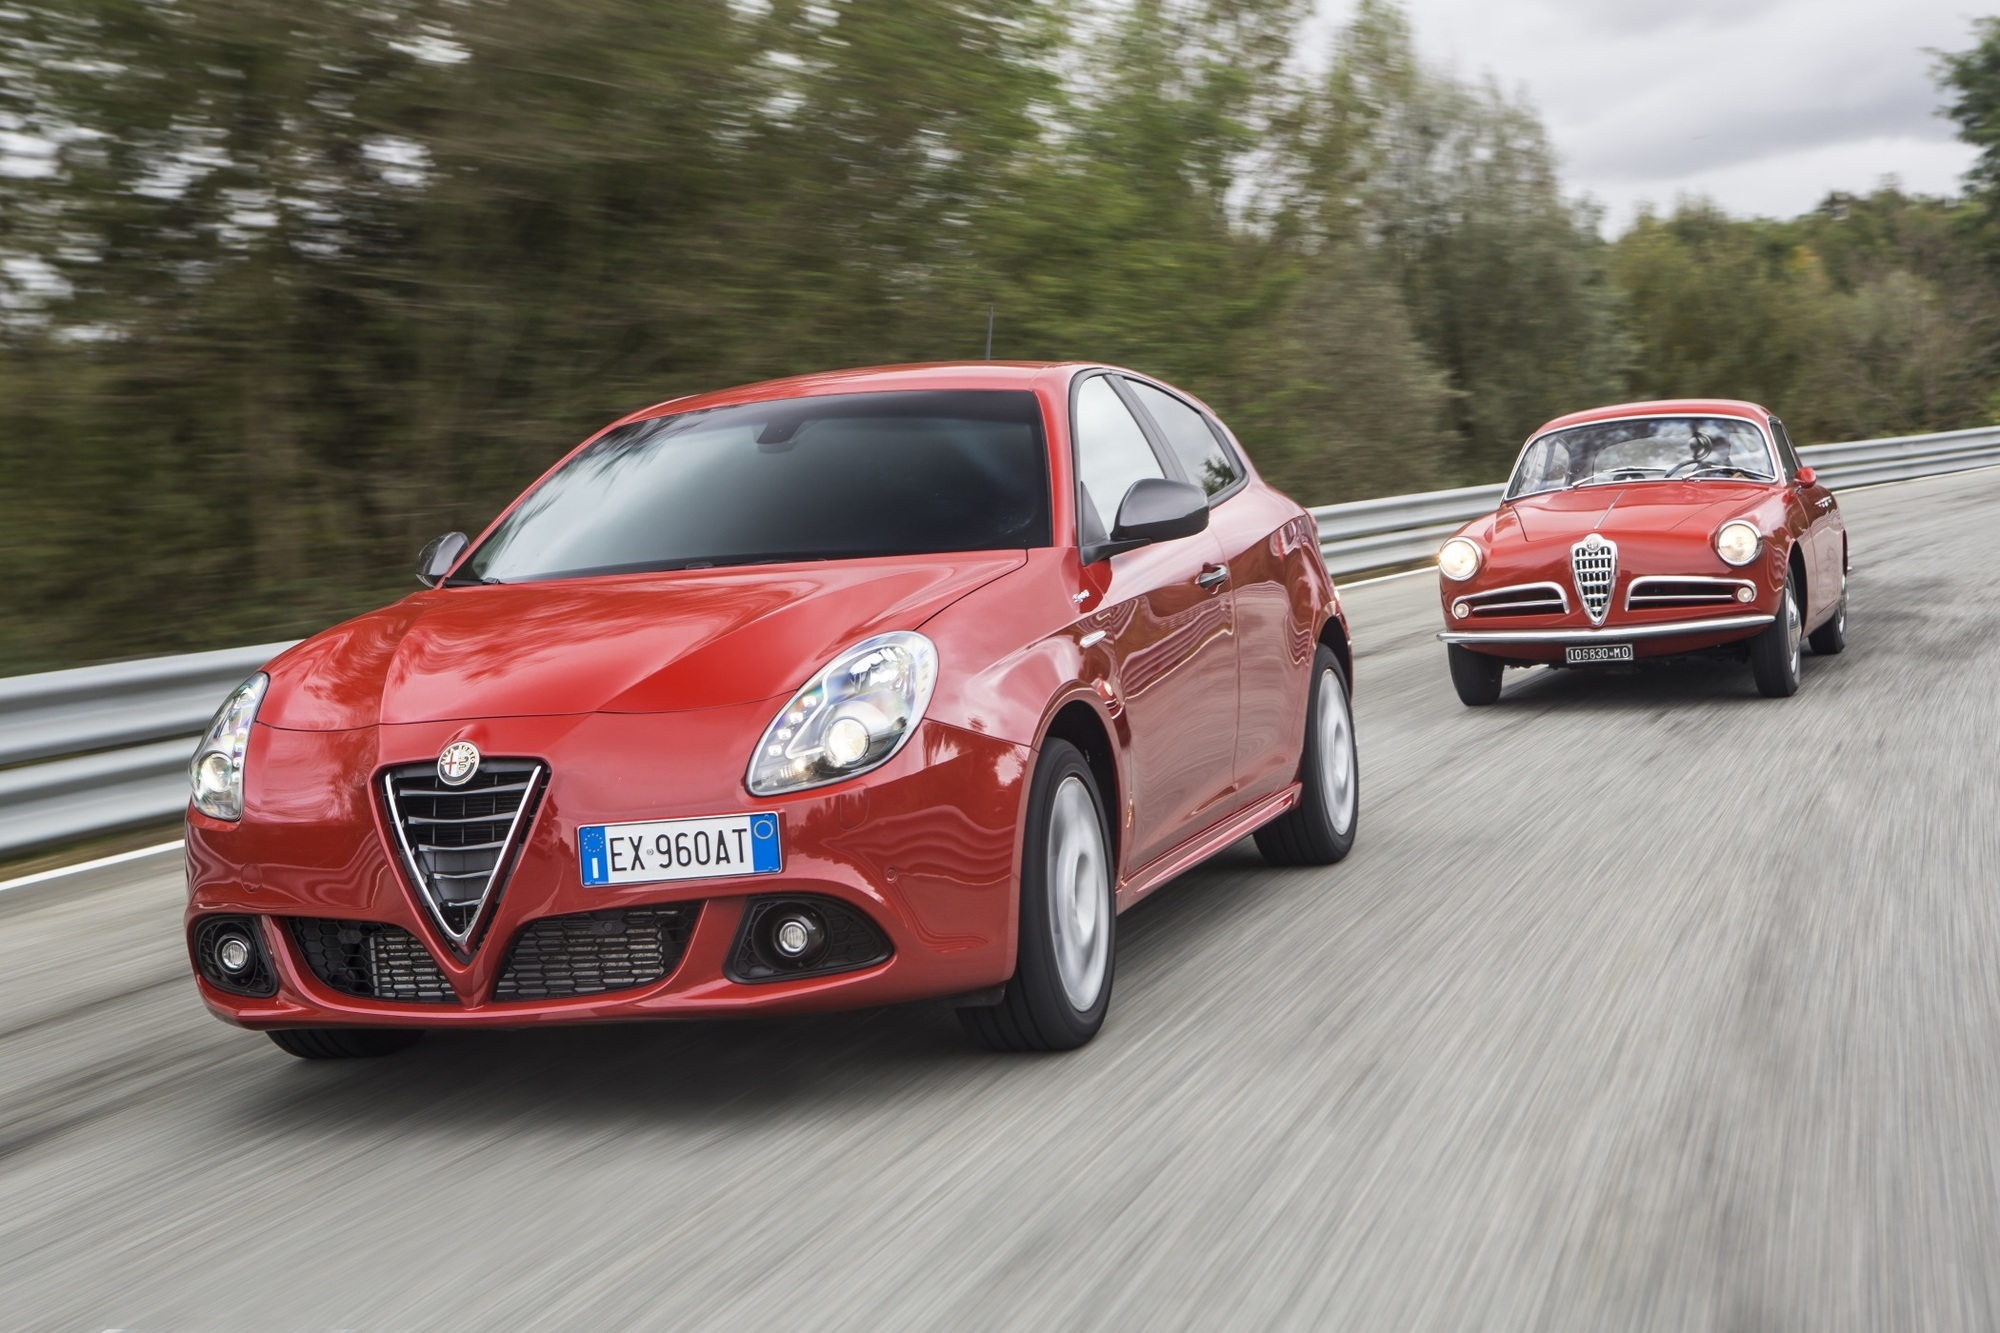 Fahrbericht: Alfa Romeo Giulietta Sprint - Die Legende lebt